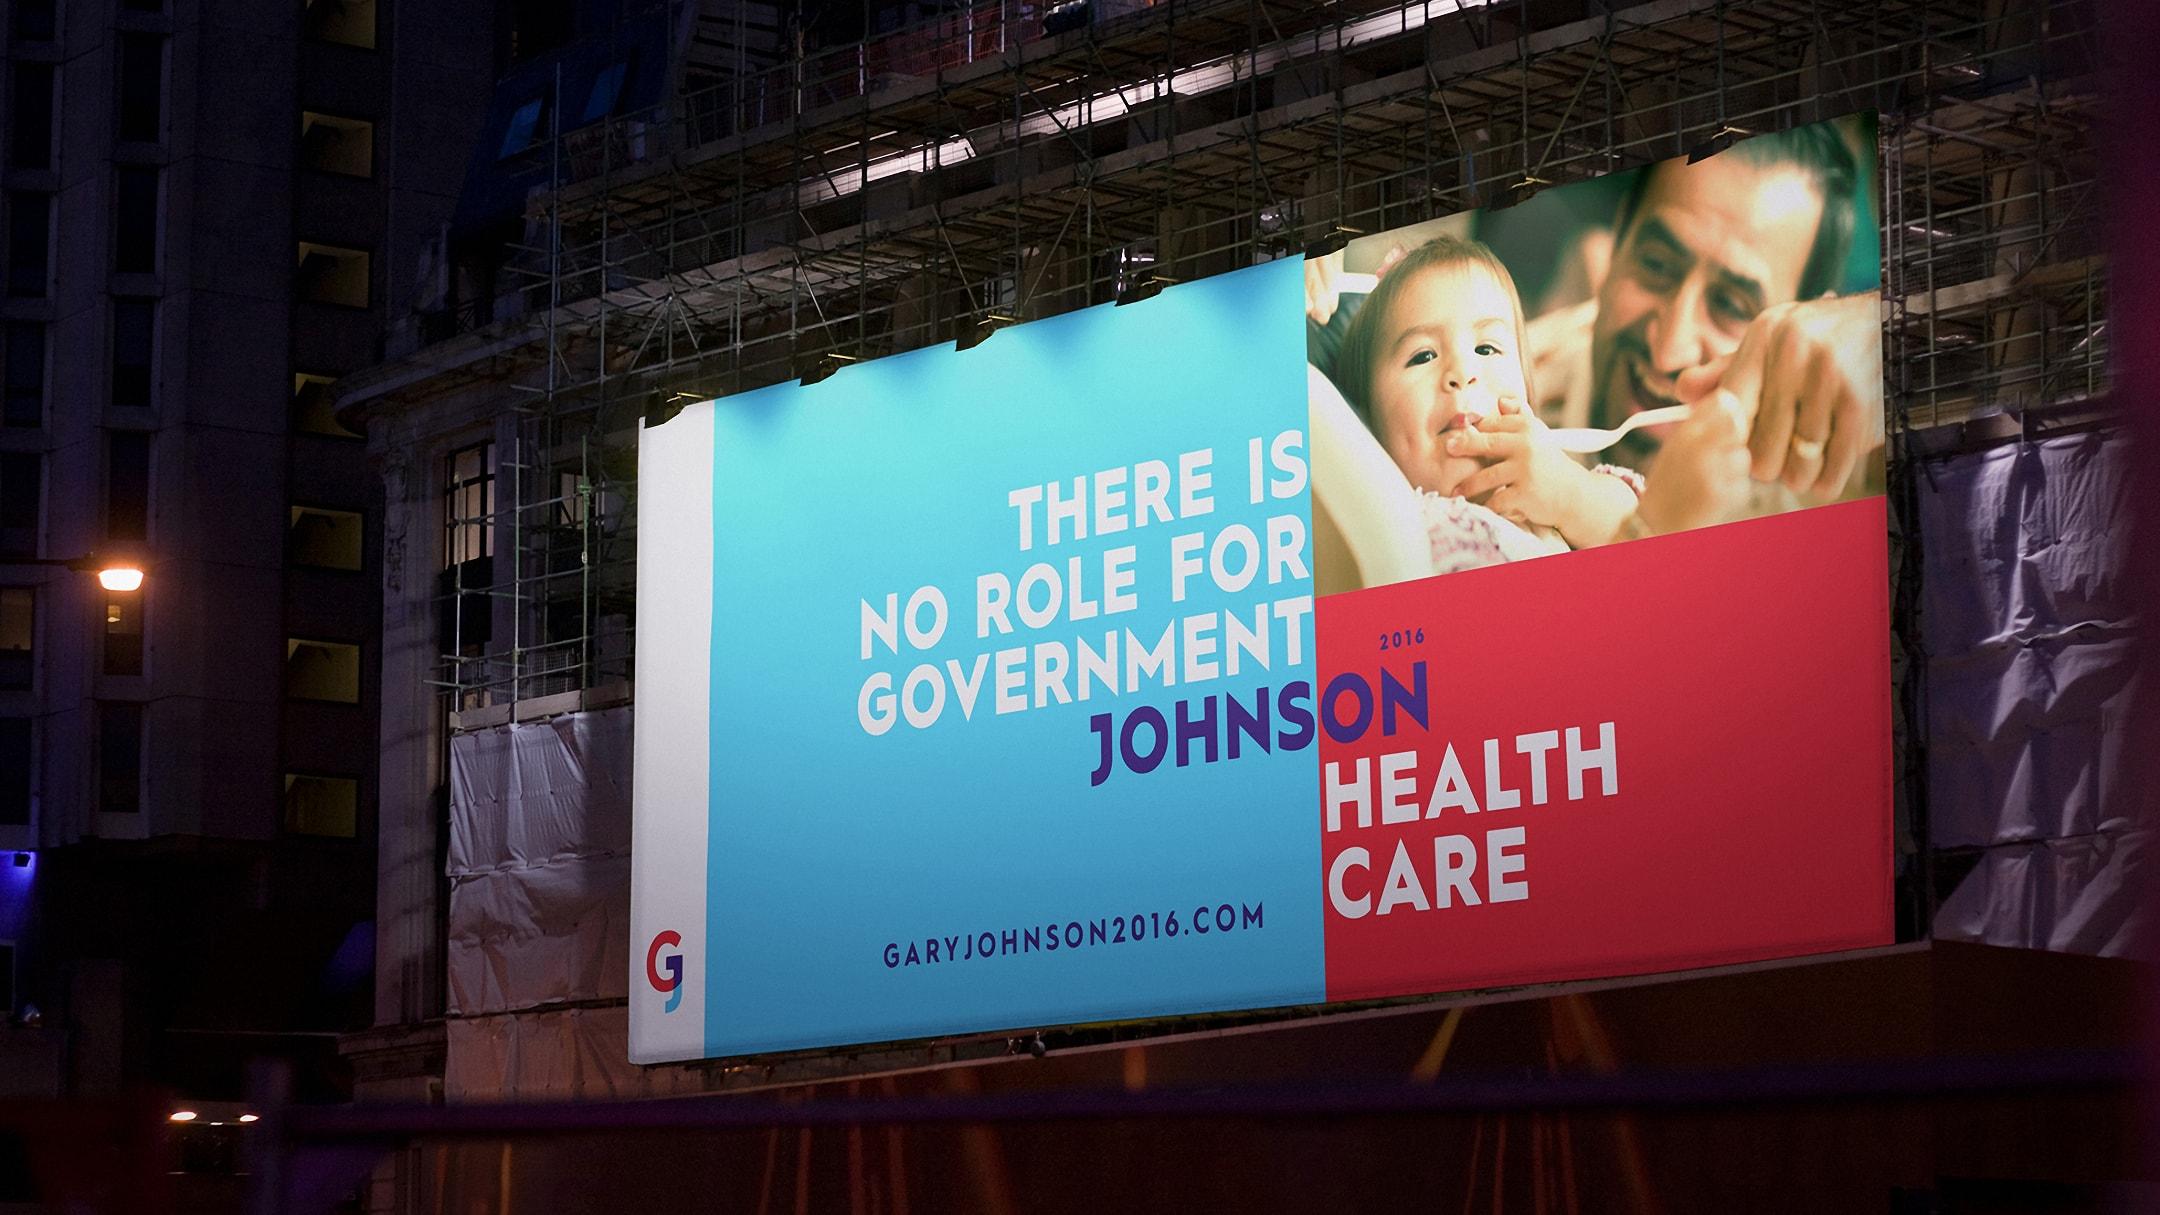 Gary Johnson spec campaign billboard